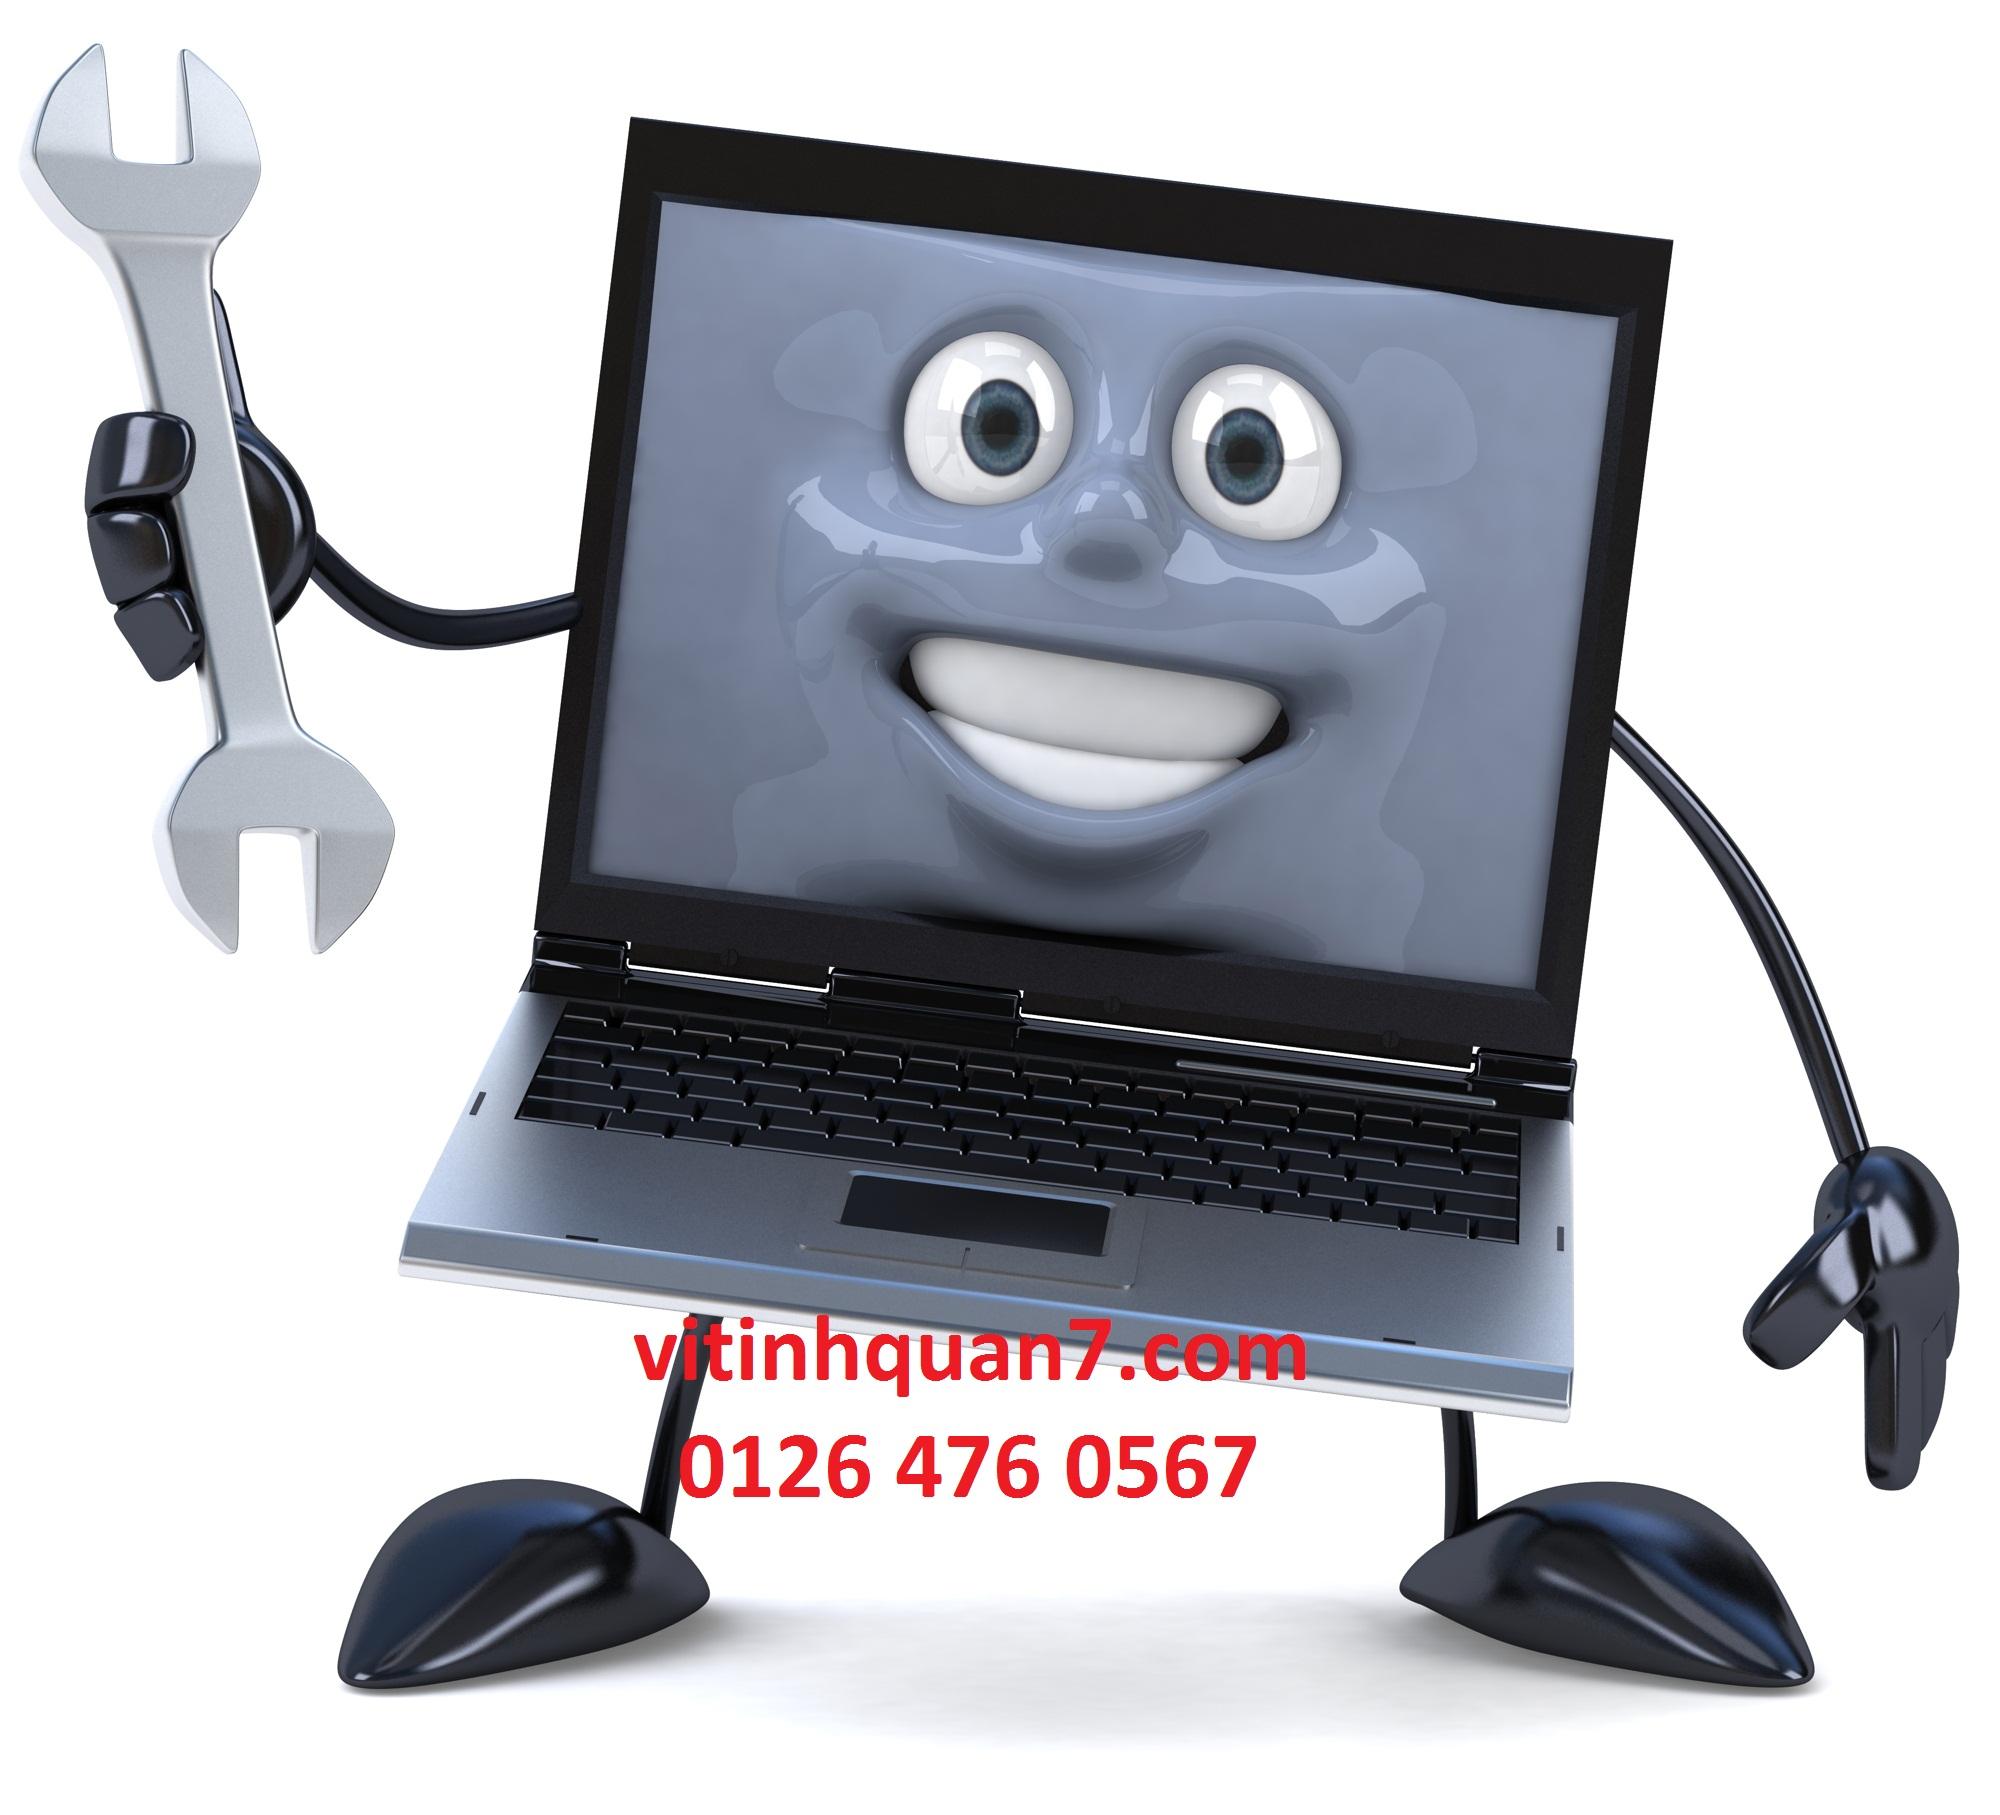 Sửa laptop tại nhà quận 2